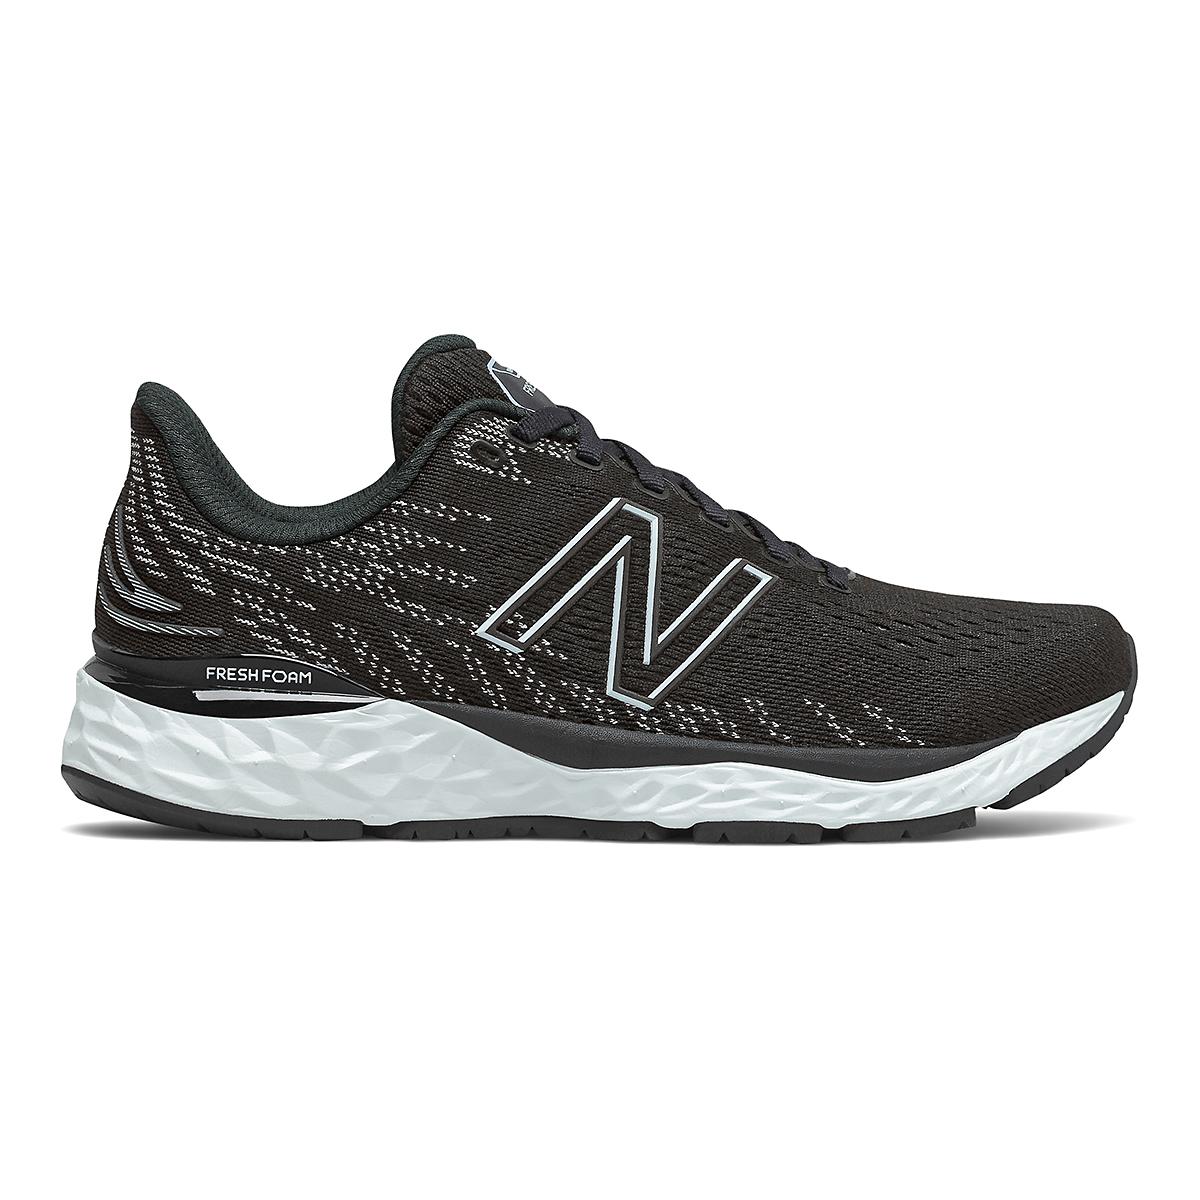 Women's New Balance 880V11 Running Shoe - Color: Black/Star Glo - Size: 5 - Width: Narrow, Black/Star Glo, large, image 1